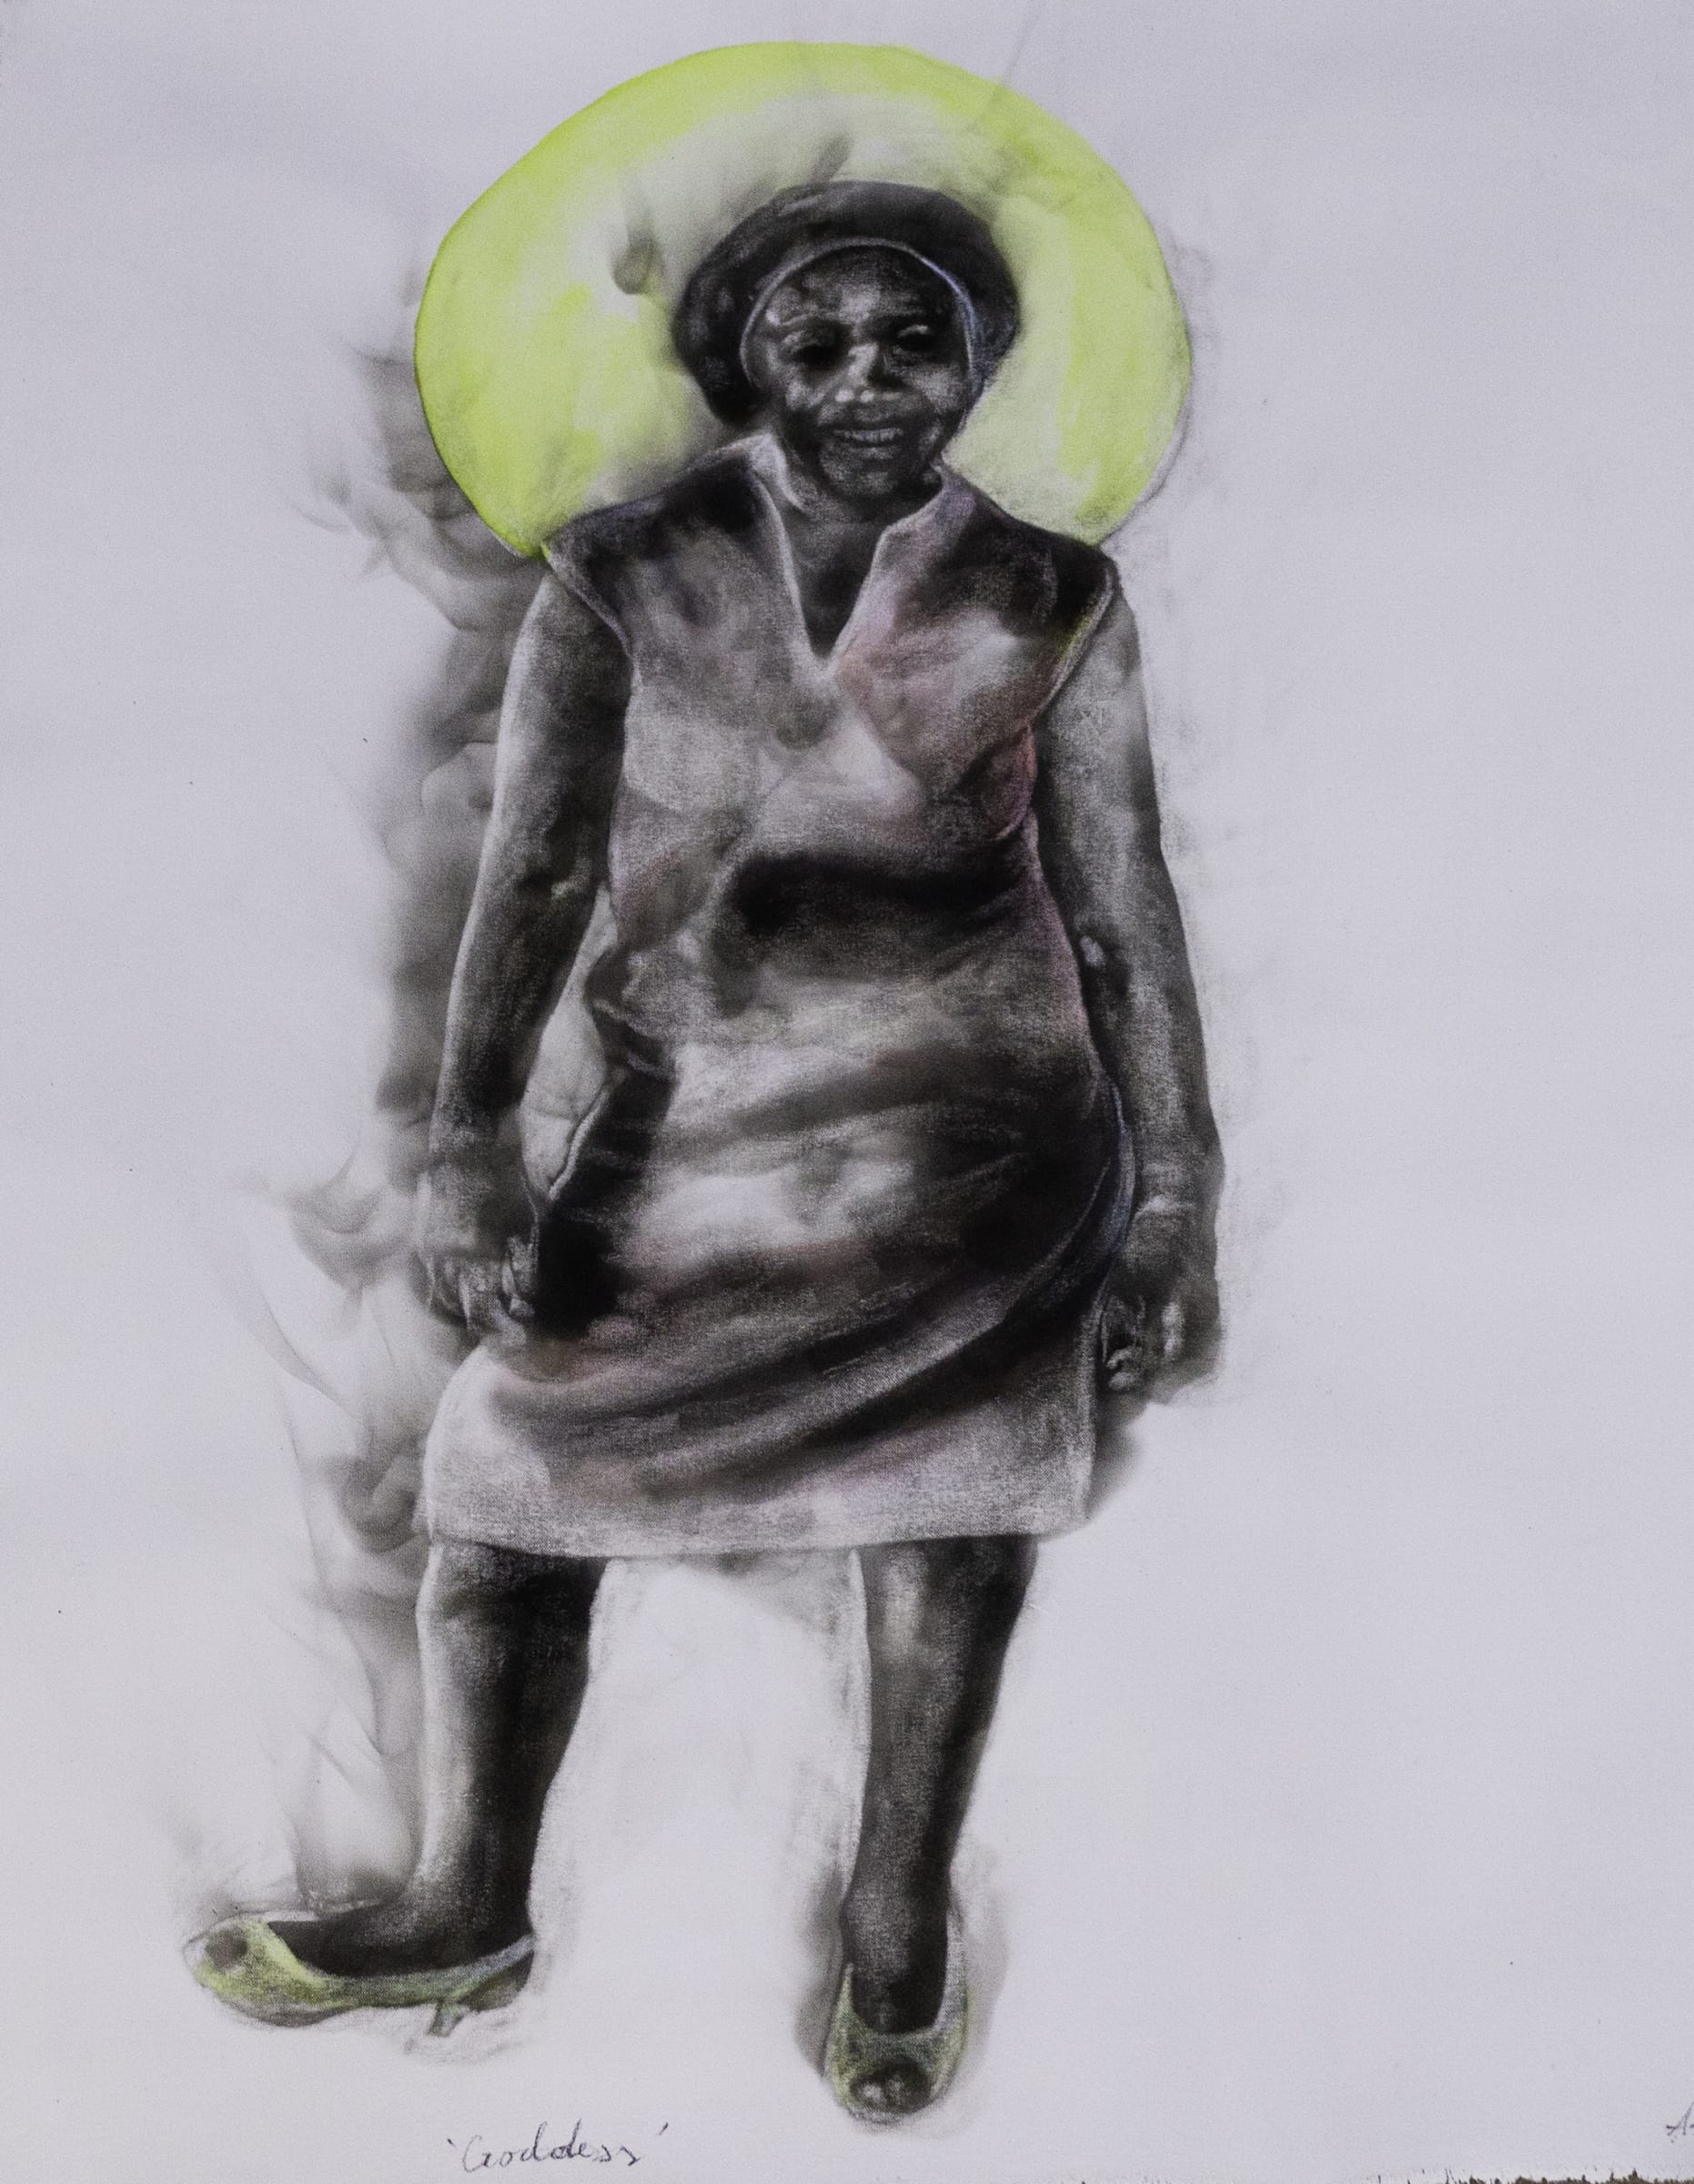 <span class=&#34;link fancybox-details-link&#34;><a href=&#34;/artists/54-azael-langa/works/3299-azael-langa-goddess-2019/&#34;>View Detail Page</a></span><div class=&#34;artist&#34;><strong>Azael Langa</strong></div> <div class=&#34;title&#34;><em>Goddess</em>, 2019</div> <div class=&#34;medium&#34;>Smoke, Ink And String On Canvas</div> <div class=&#34;dimensions&#34;>110cm x 82cm (123.5cm x 95.5cm framed)</div><div class=&#34;price&#34;>R25,600.00</div>